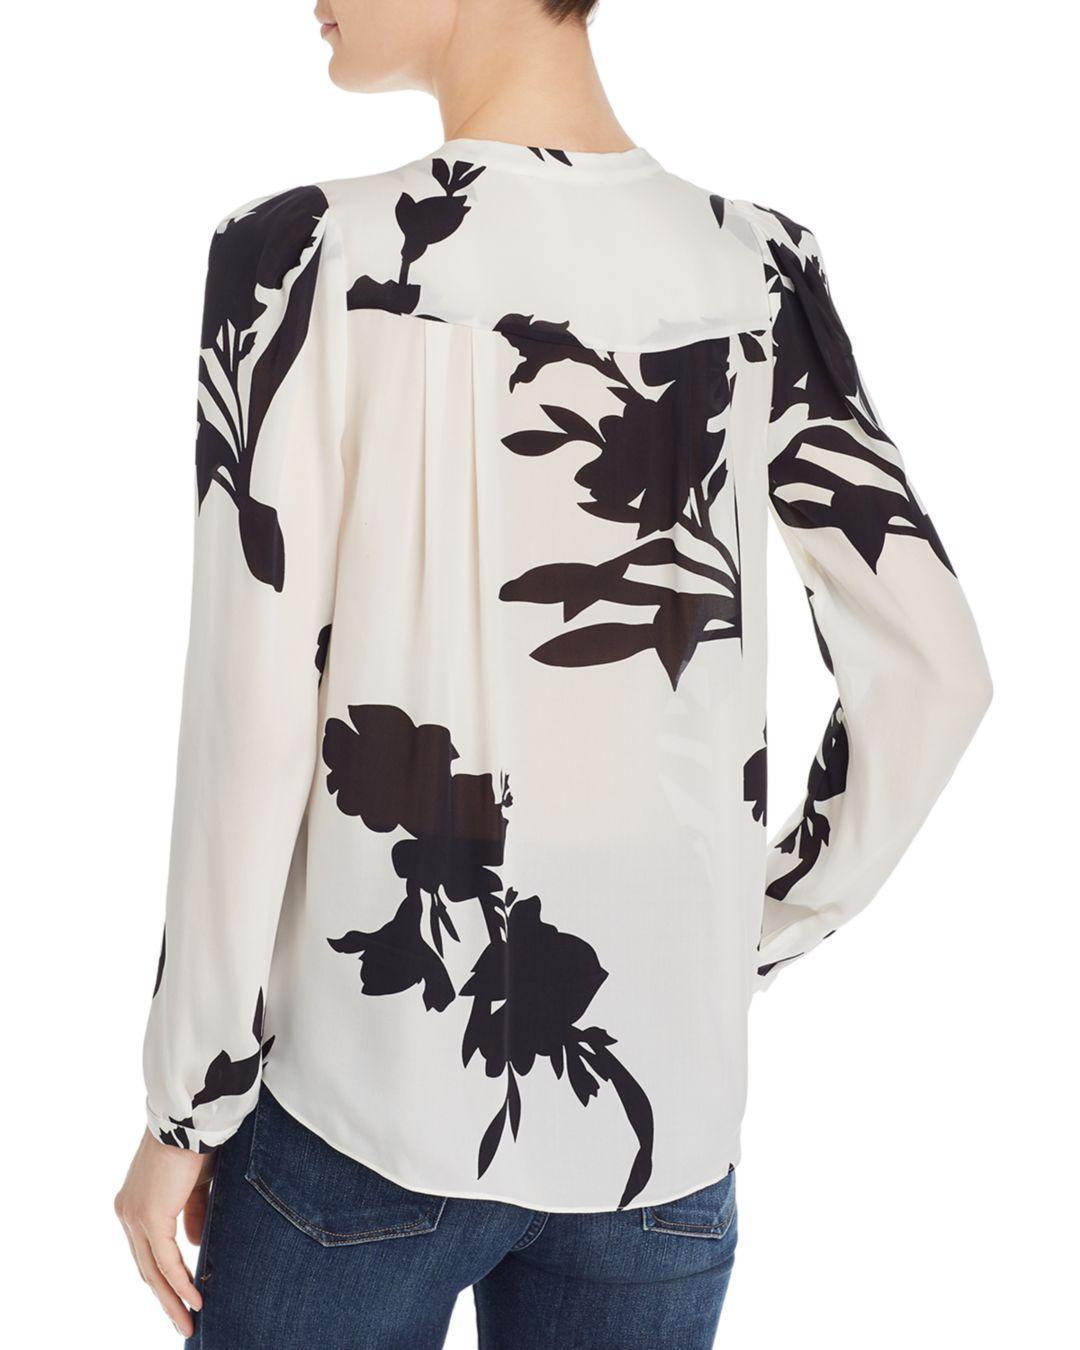 da530dd1b127 Lyst - Joie Kayvan Floral Silk Blouse